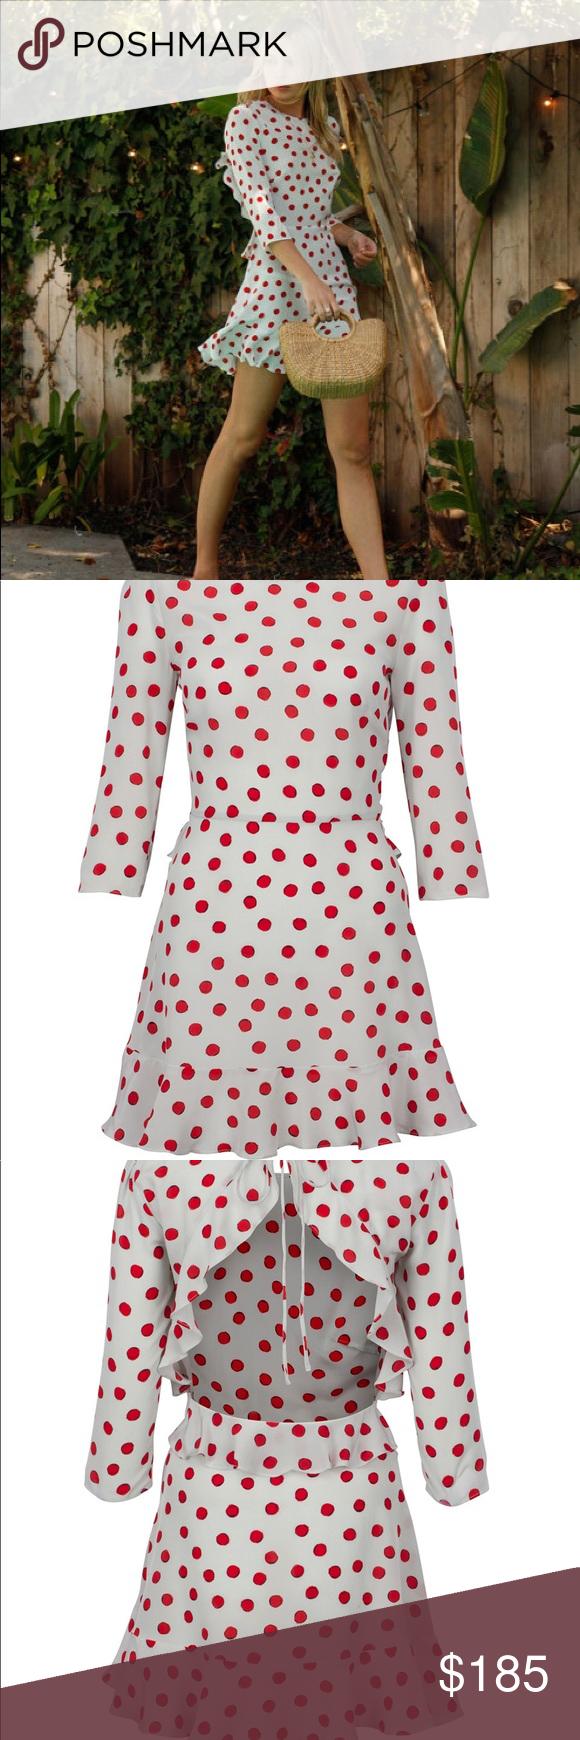 Realisation par ucgoldieud cherry mini dress nwt mini dresses dress